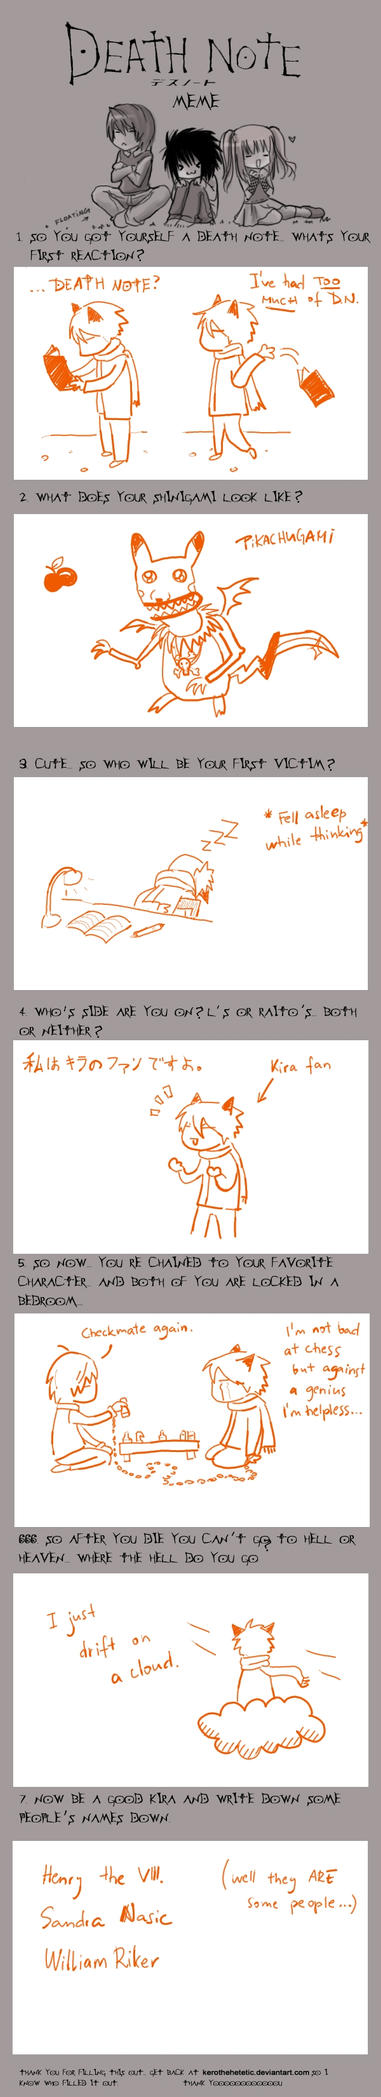 The Death Note meme by KitsuneBara